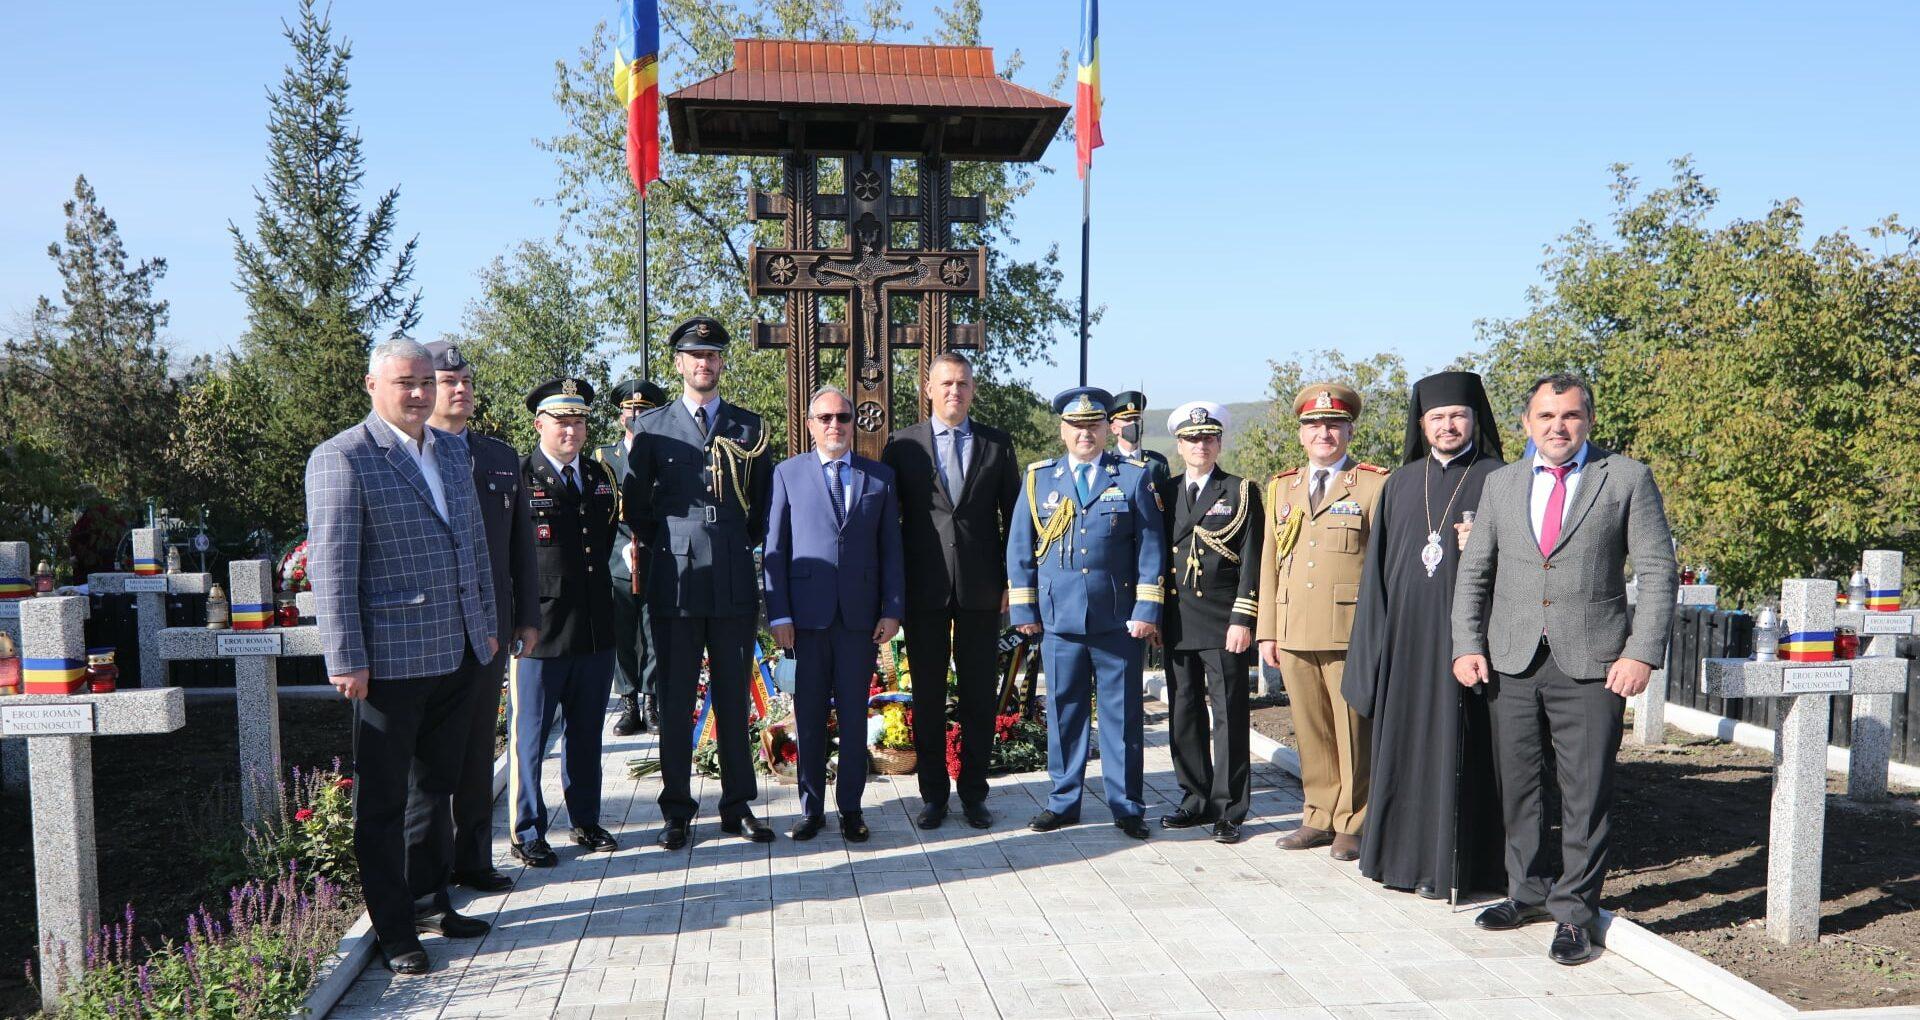 Ziua Armatei Române celebrată la cimitirul eroiolor militari români din Mana, Orhei